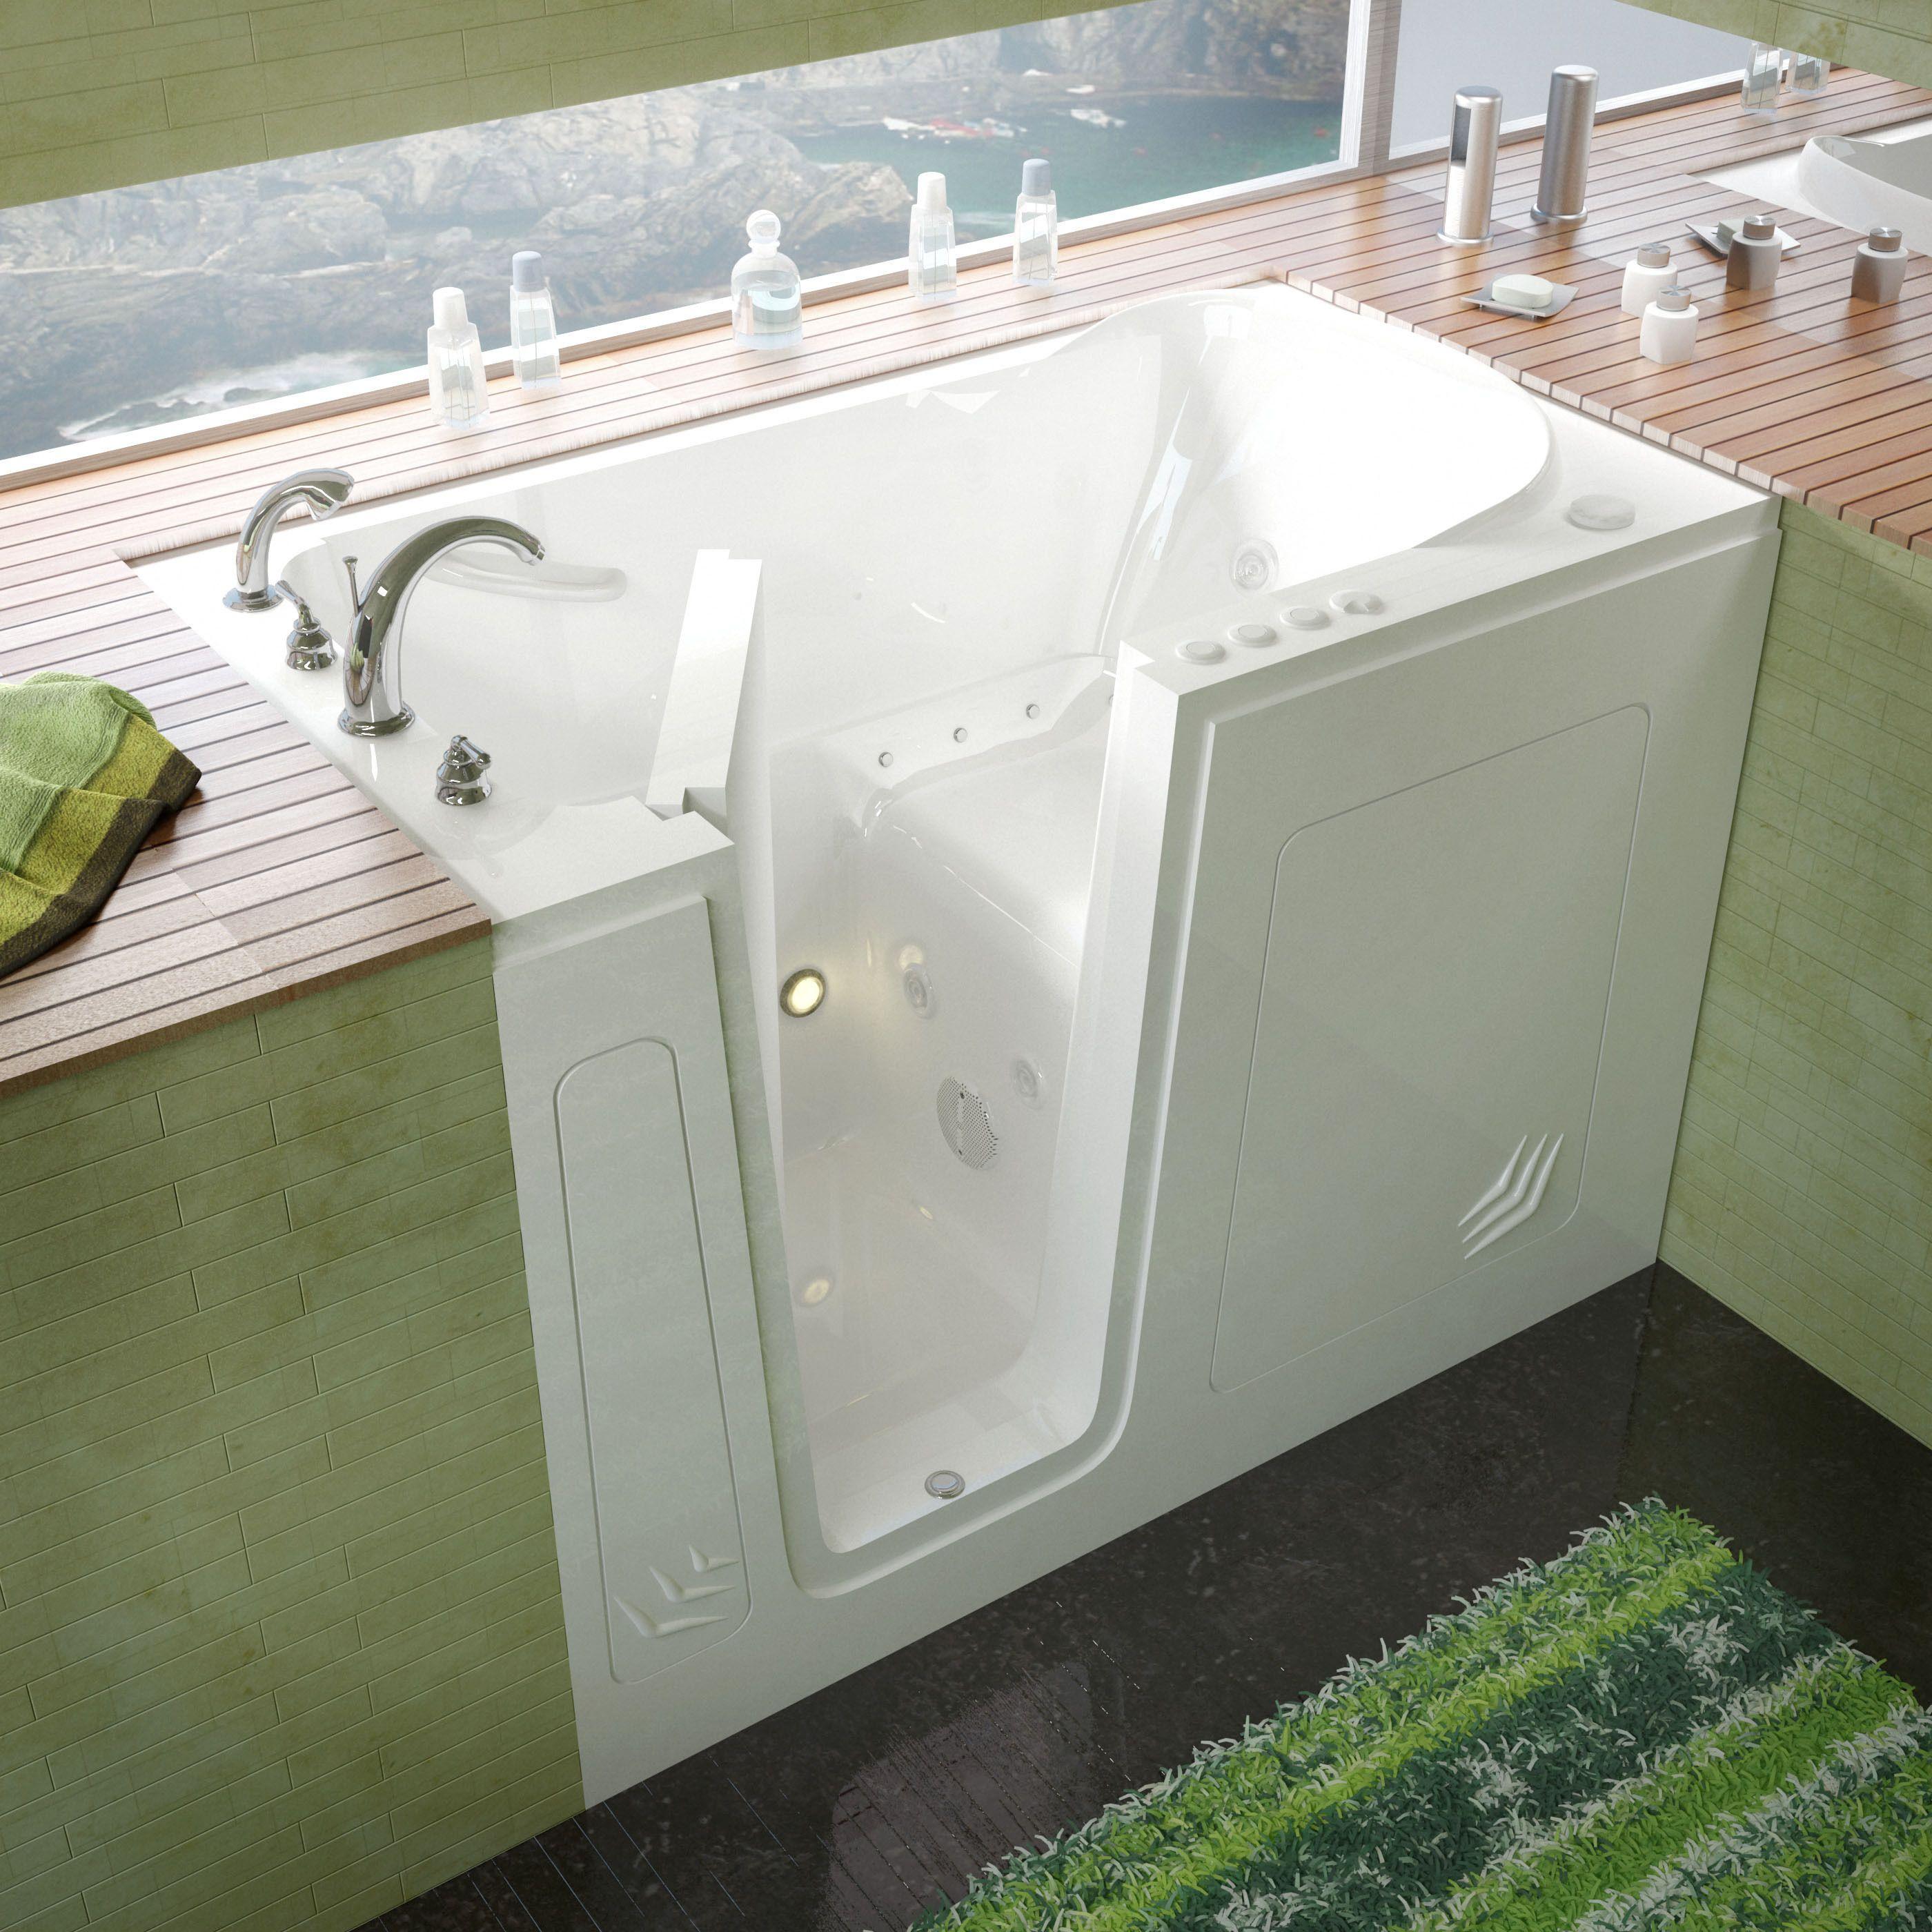 Magnificent Kohler Jet Tub Image - Bathtub Design Ideas - valtak.com